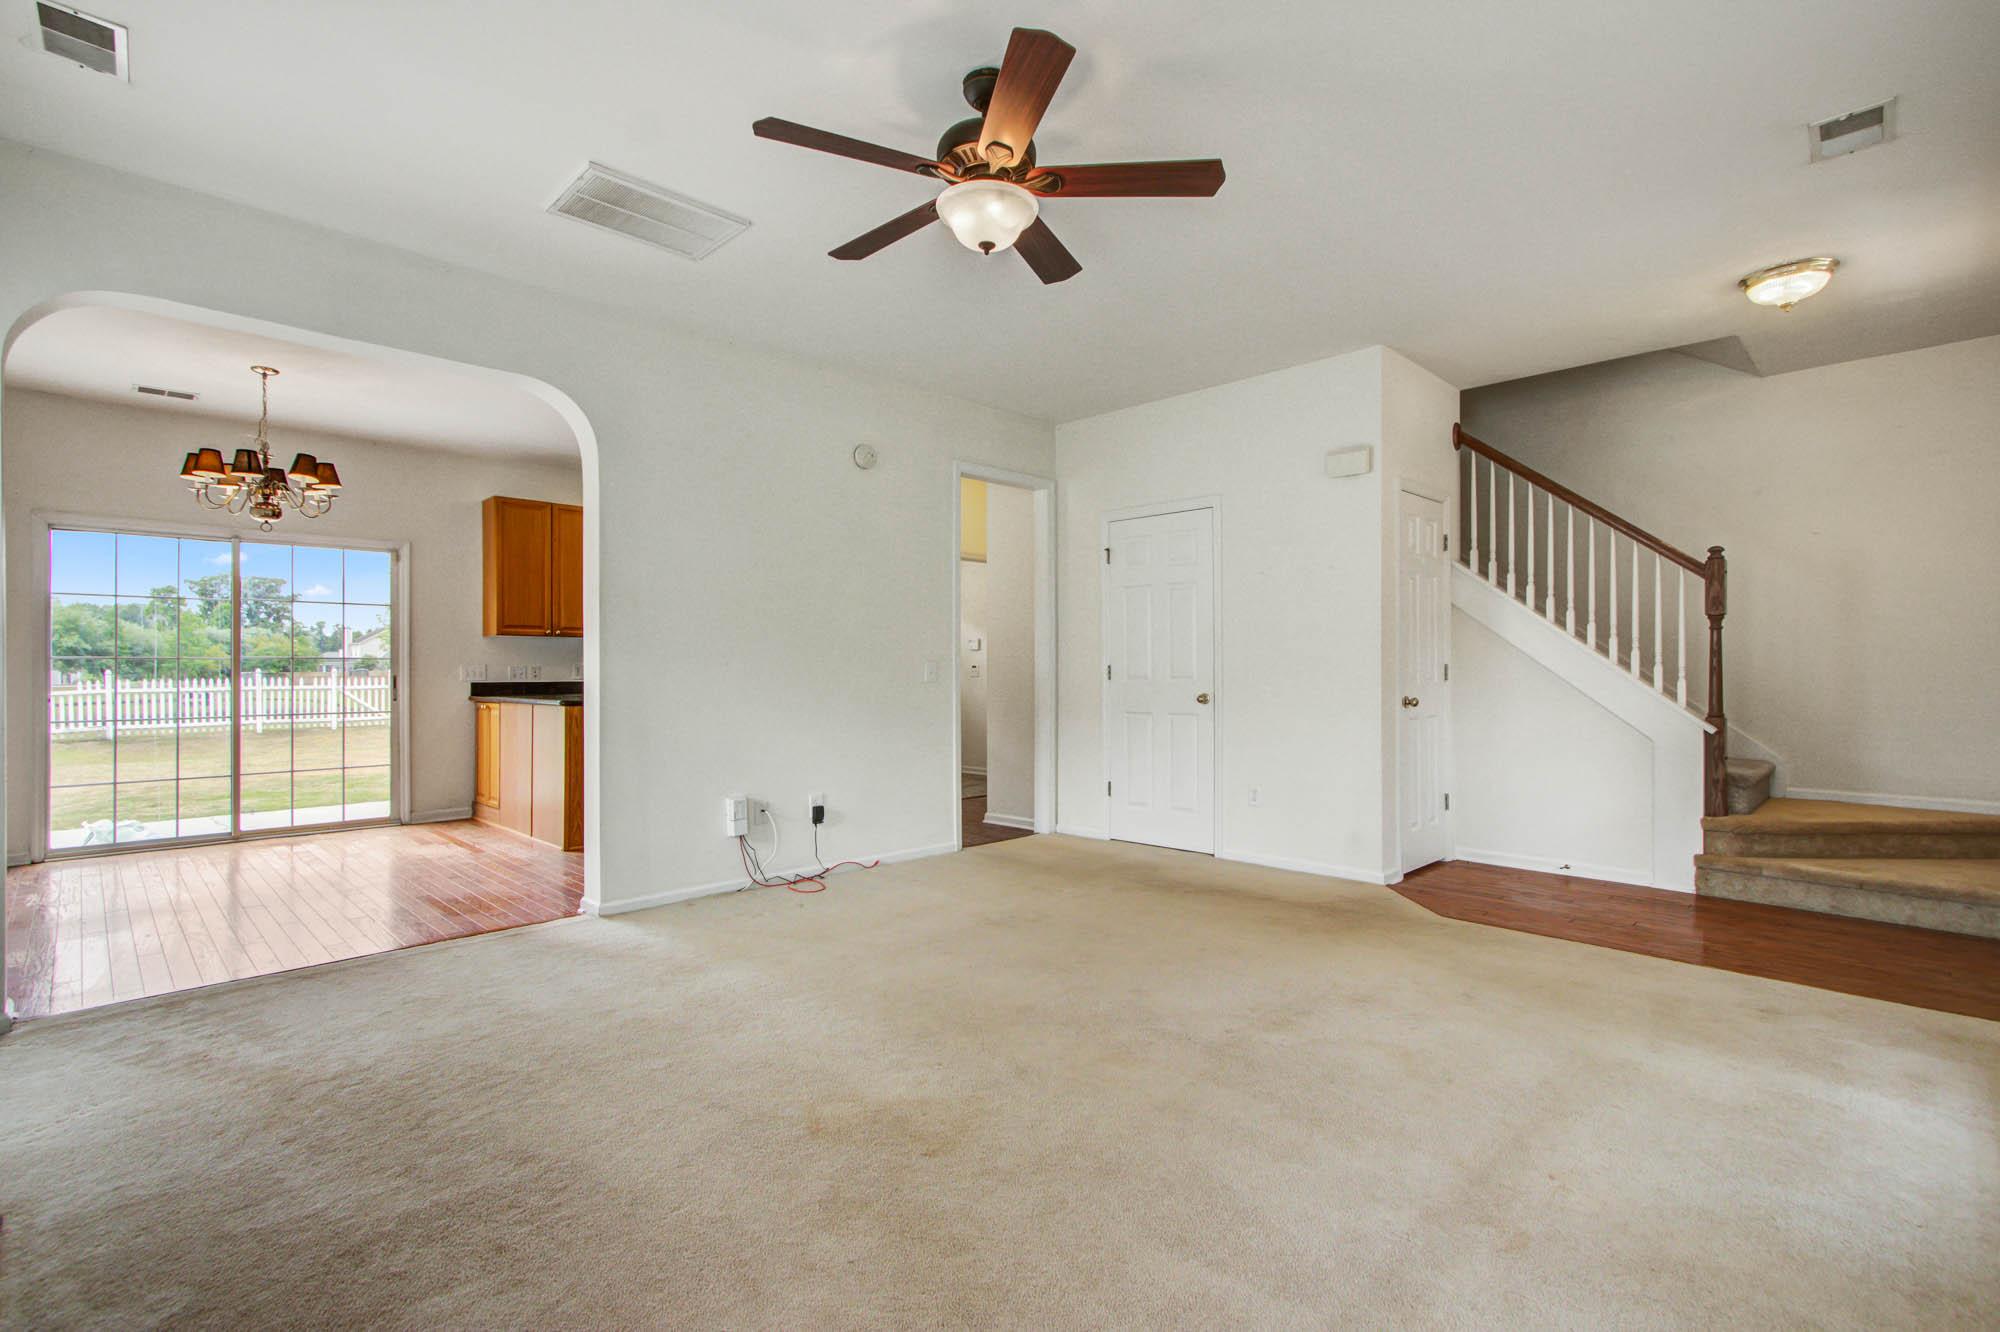 844 Bent Hickory Rd Charleston SC 29414-9076 - Photo 6